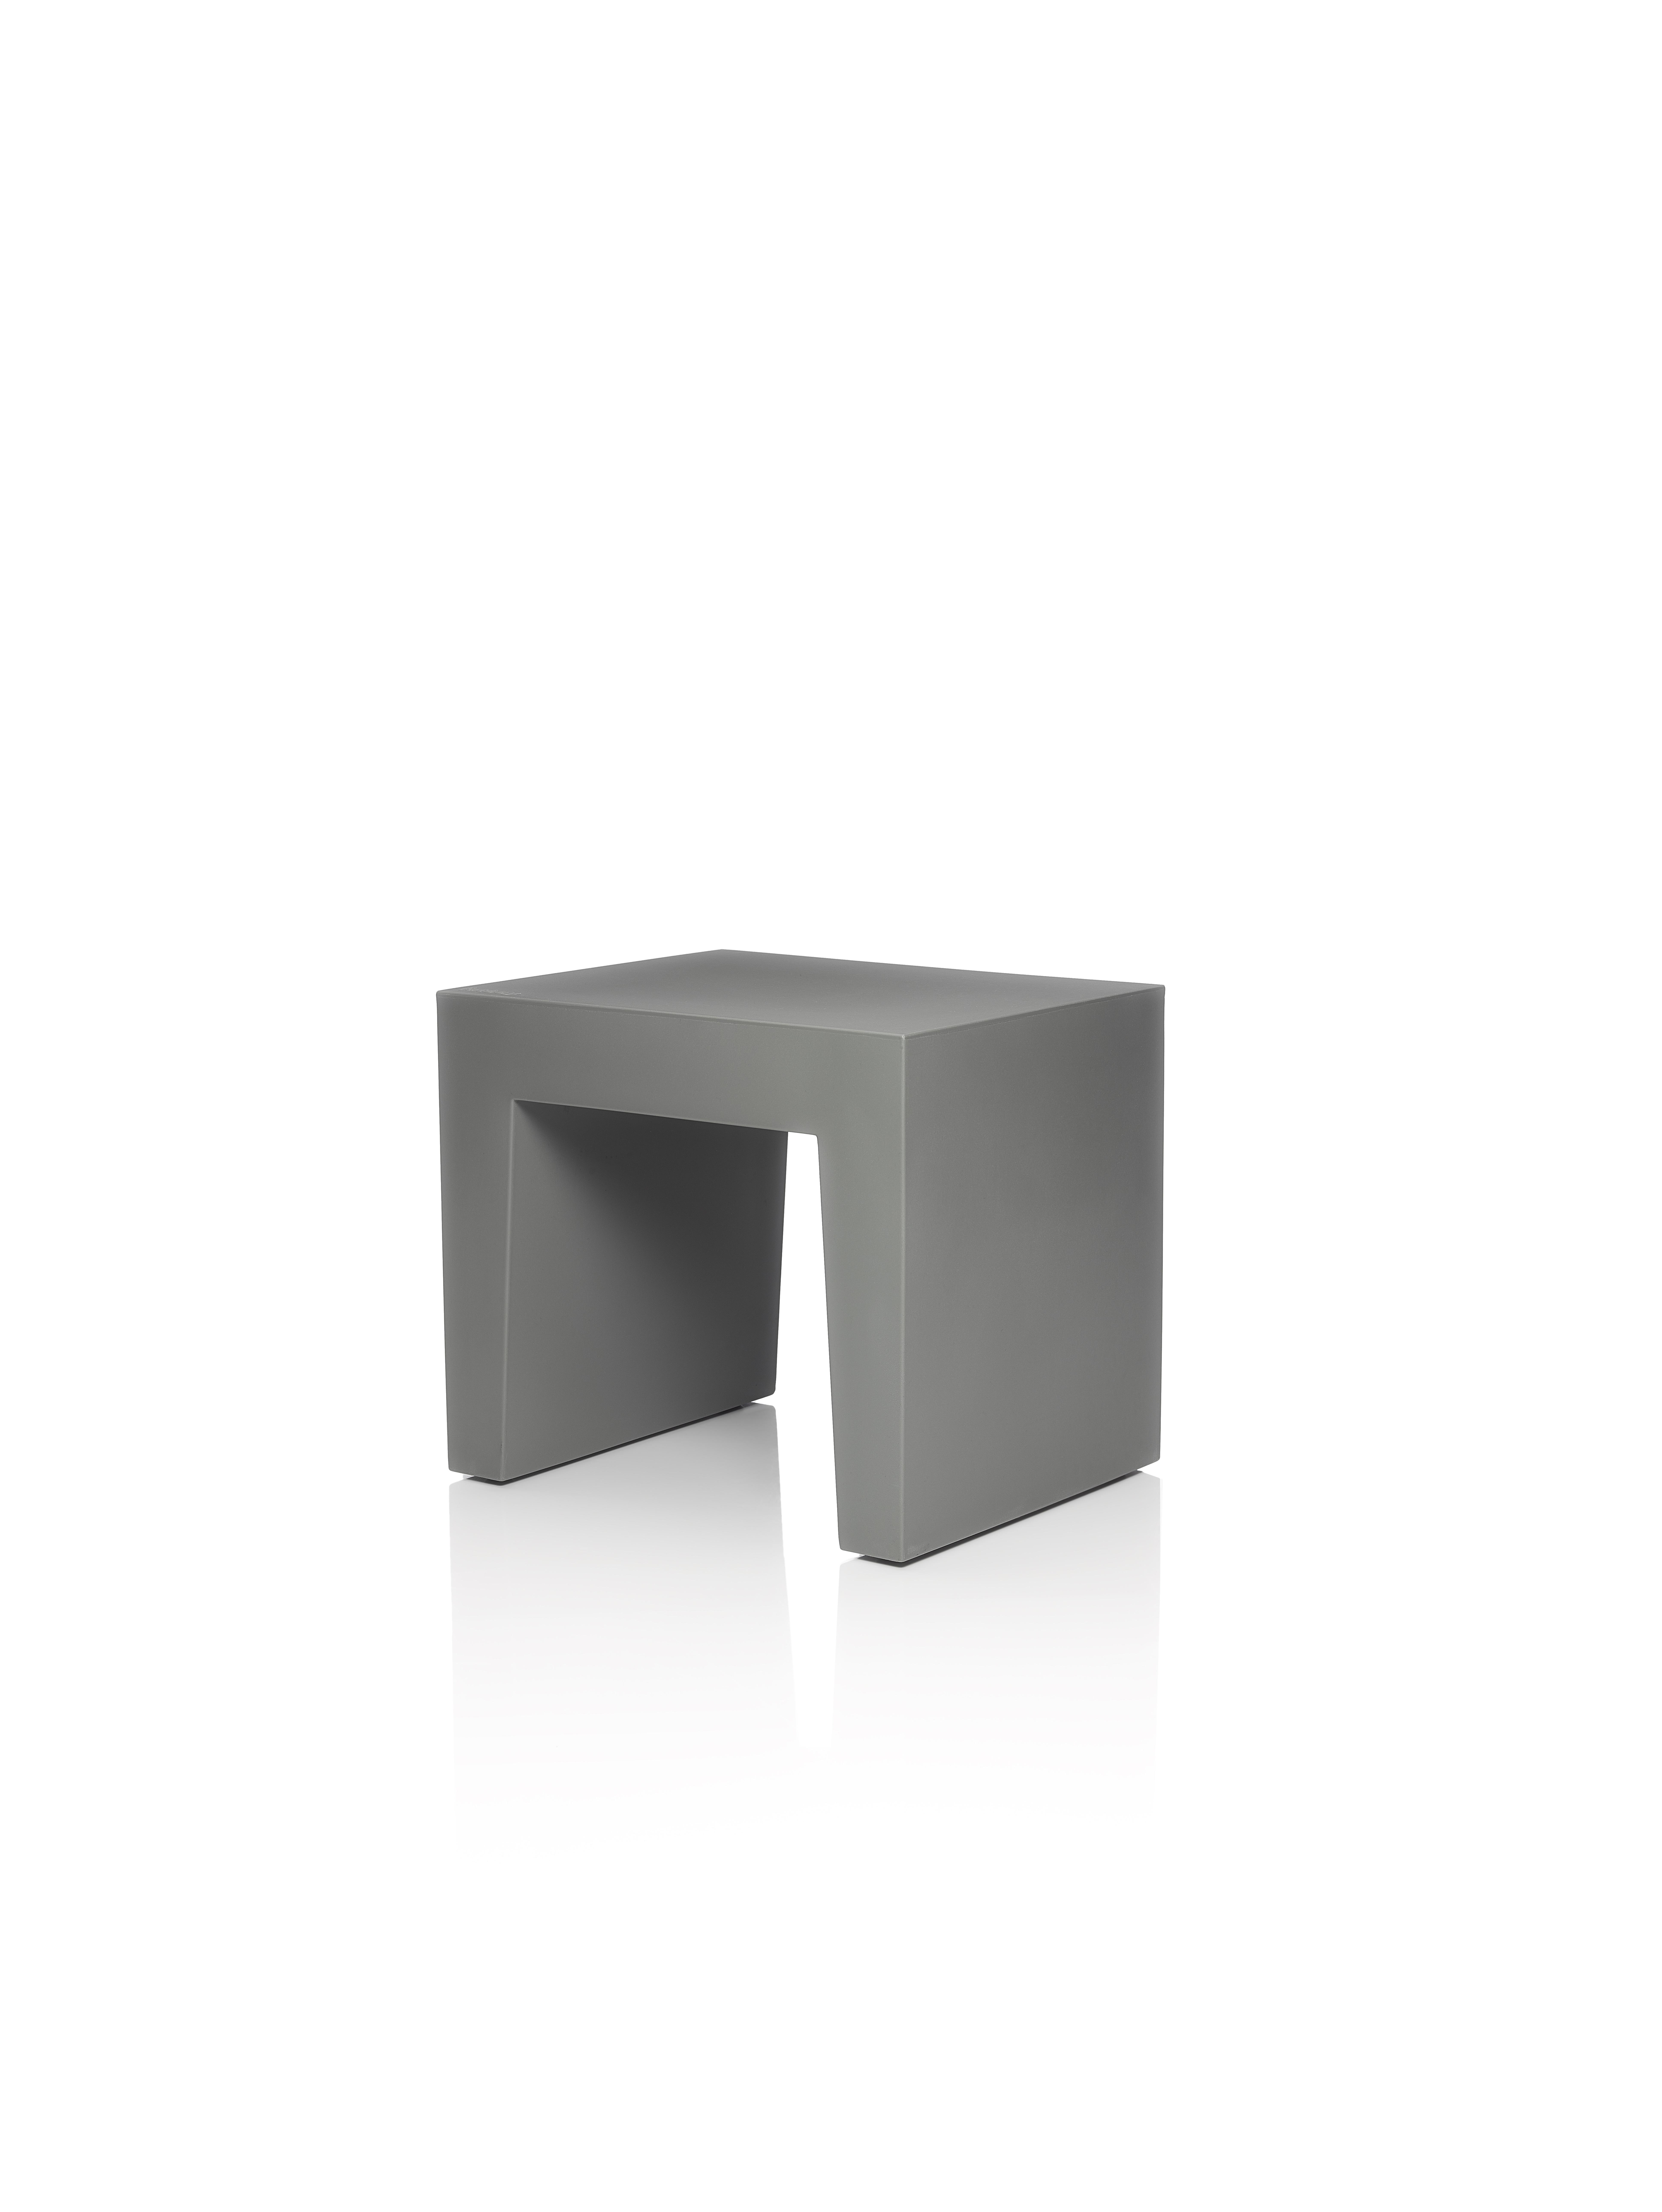 Fatboy Hocker - concrete seat